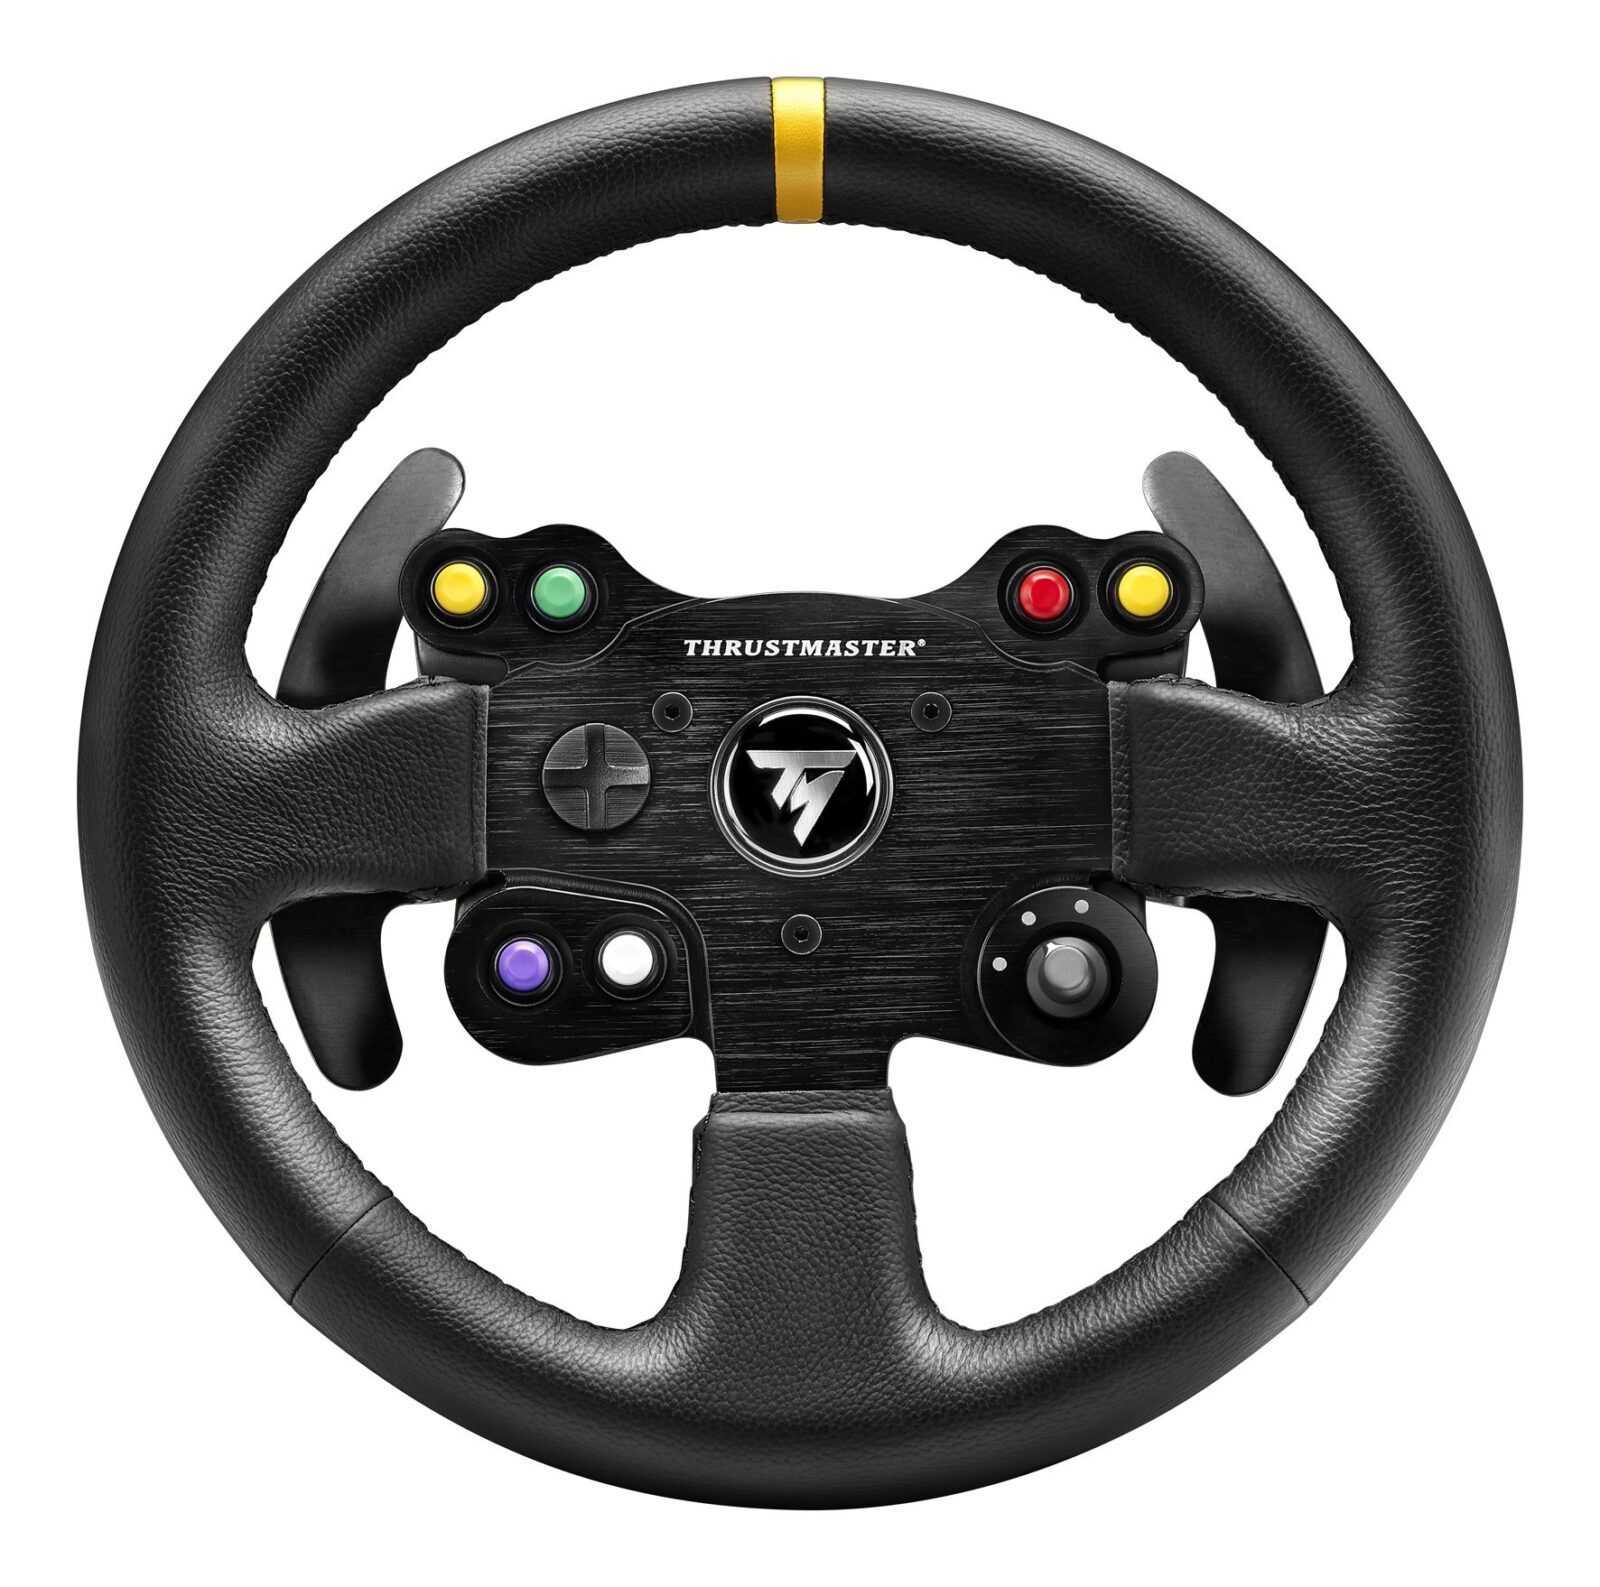 Thrustmaster Tx Racing Wheel Xbox One